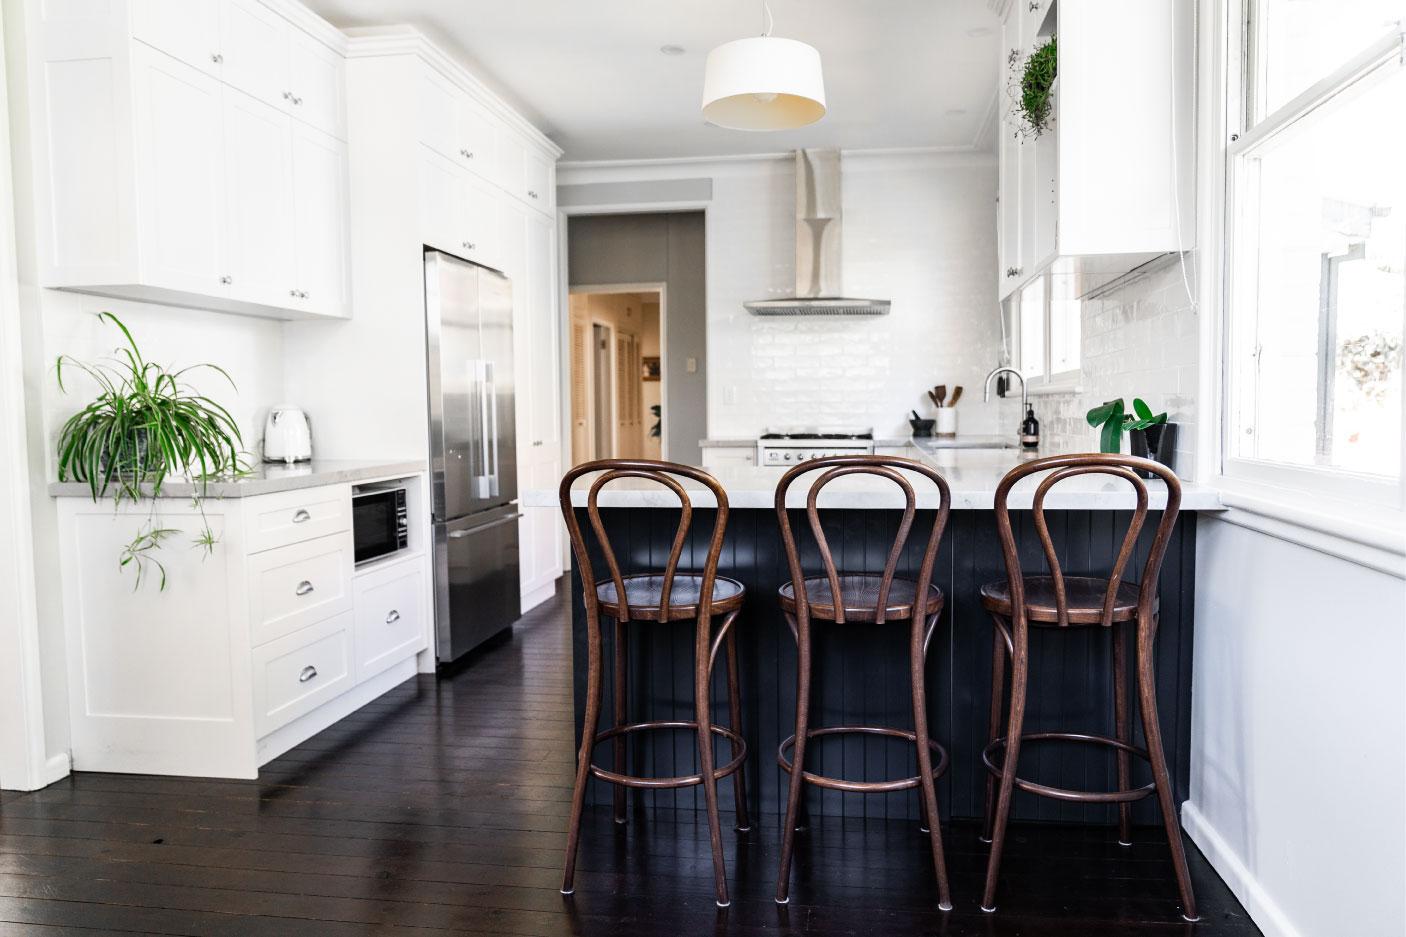 magnokitchens.com.au Lane Cove Kitchens (6).jpg